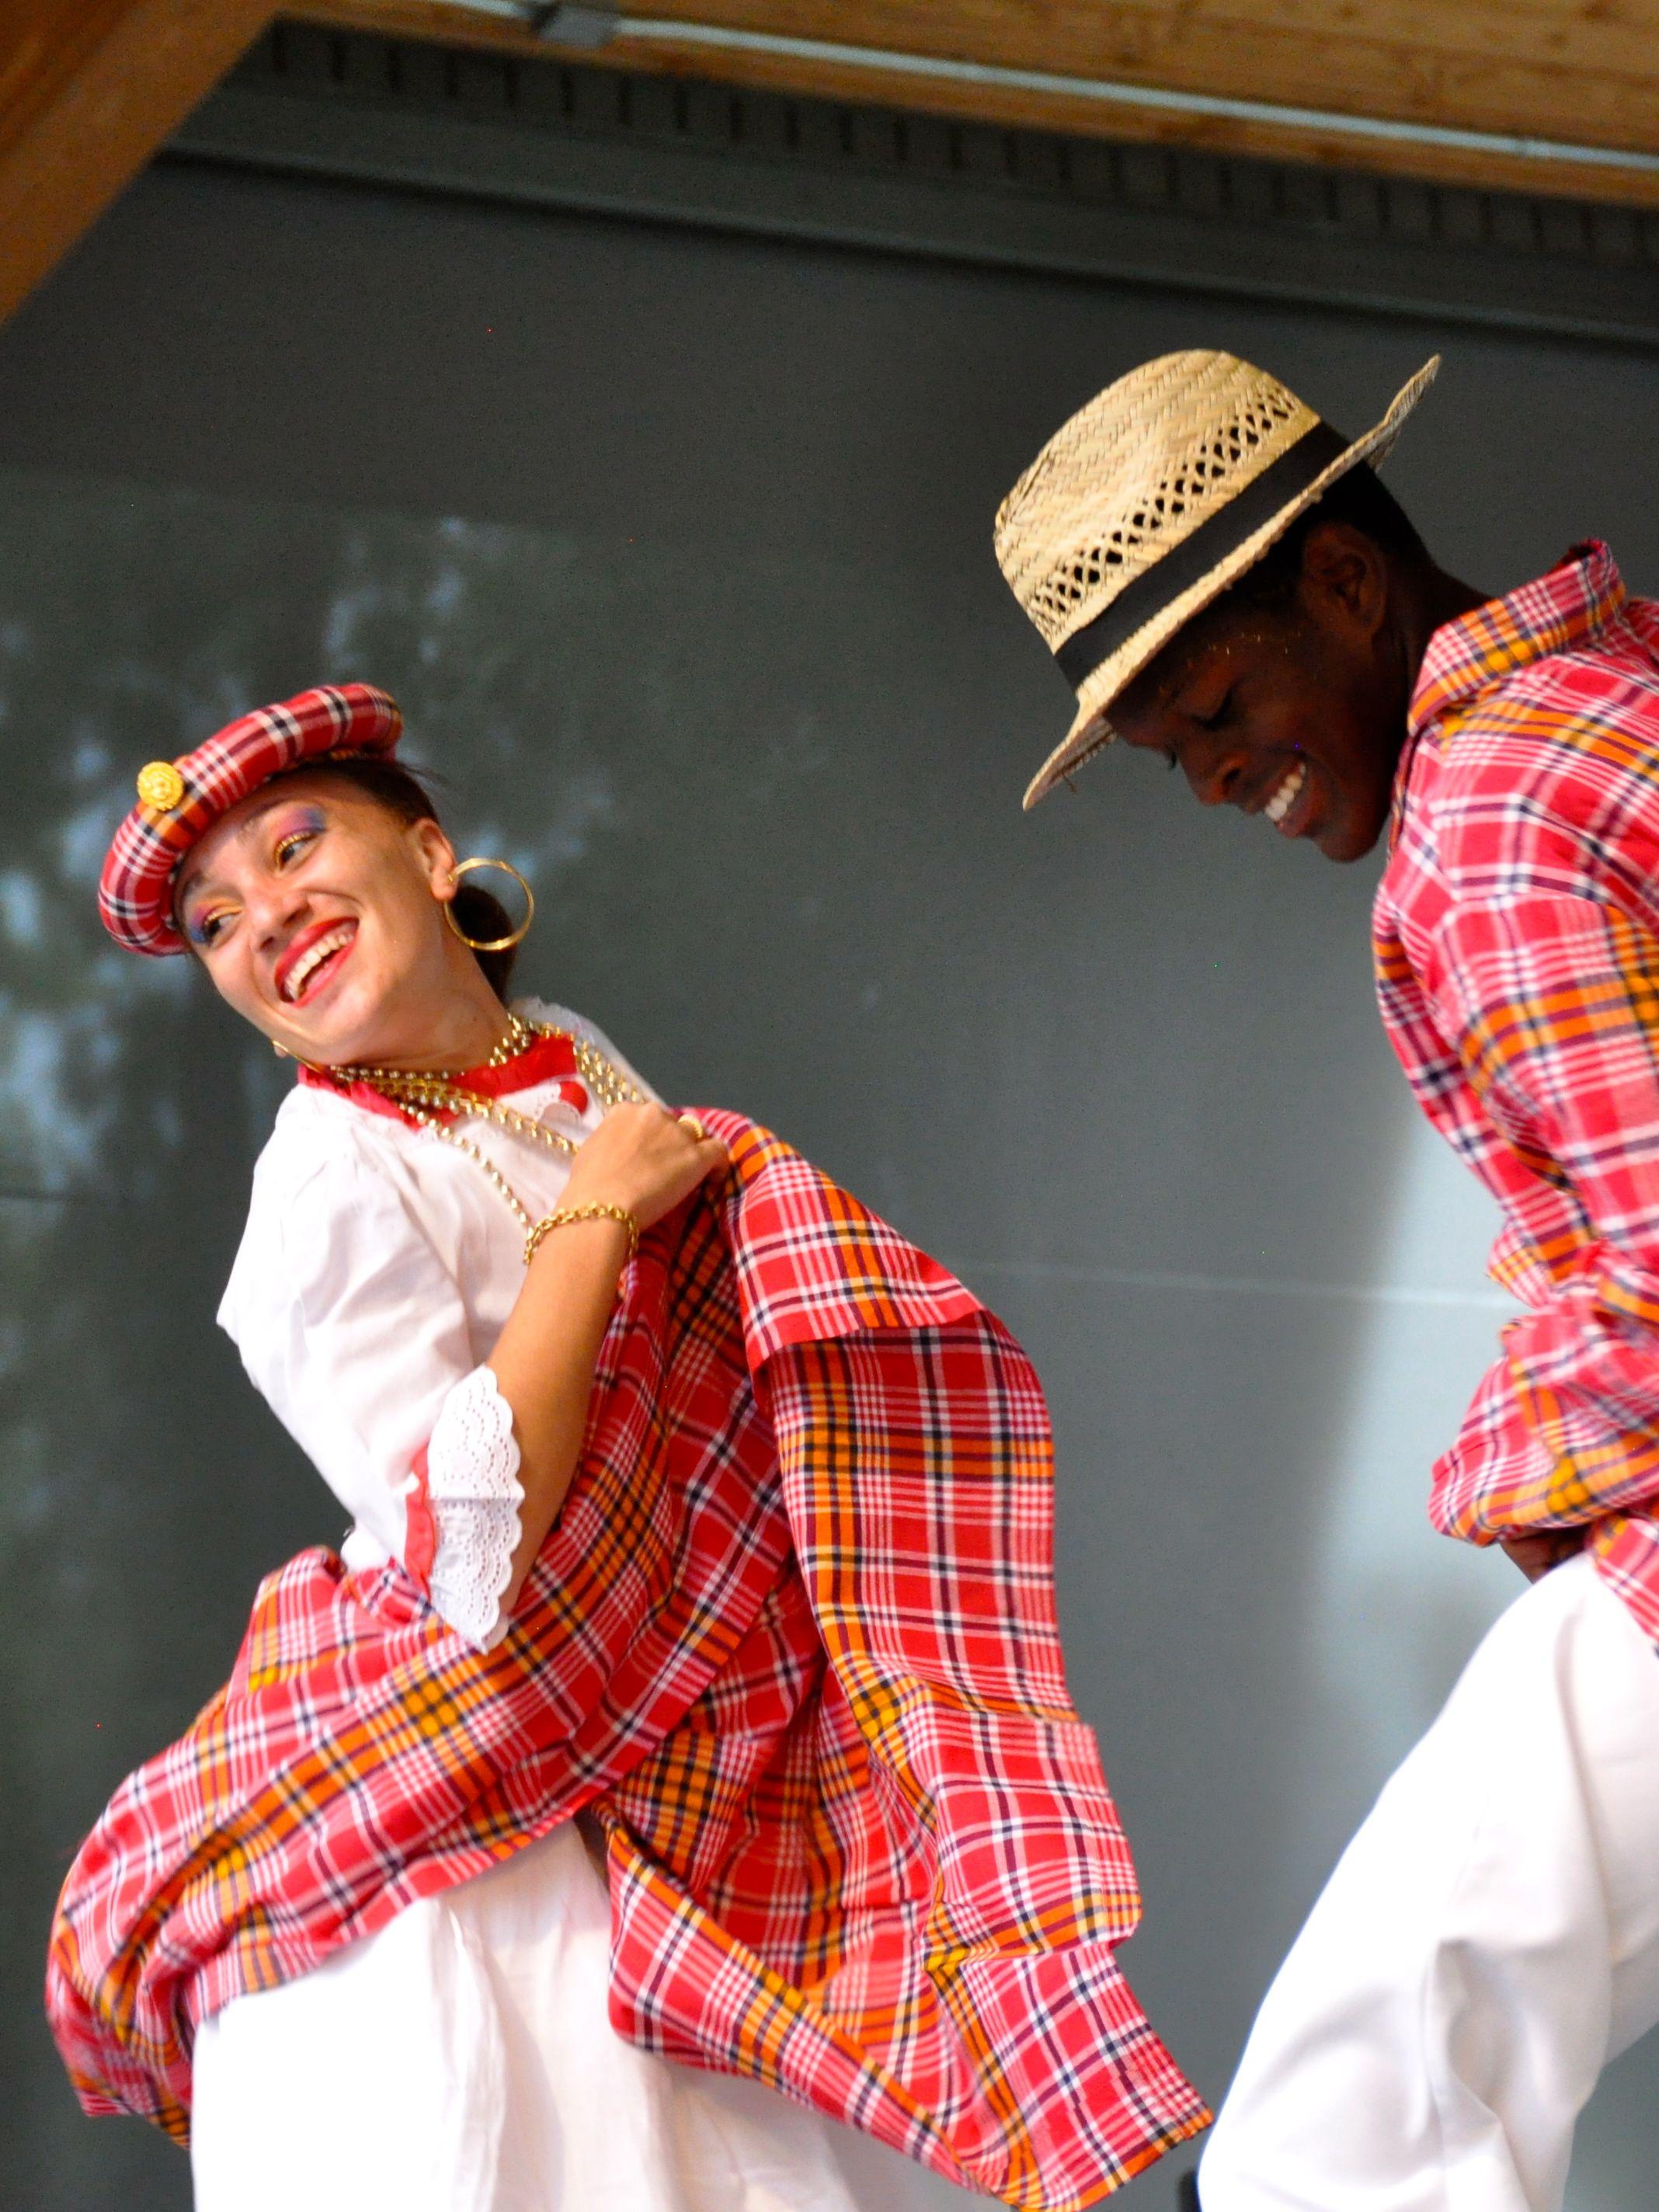 Bountiful Davis Summerfest International 2013: Martinique - Les Fonds Blancs